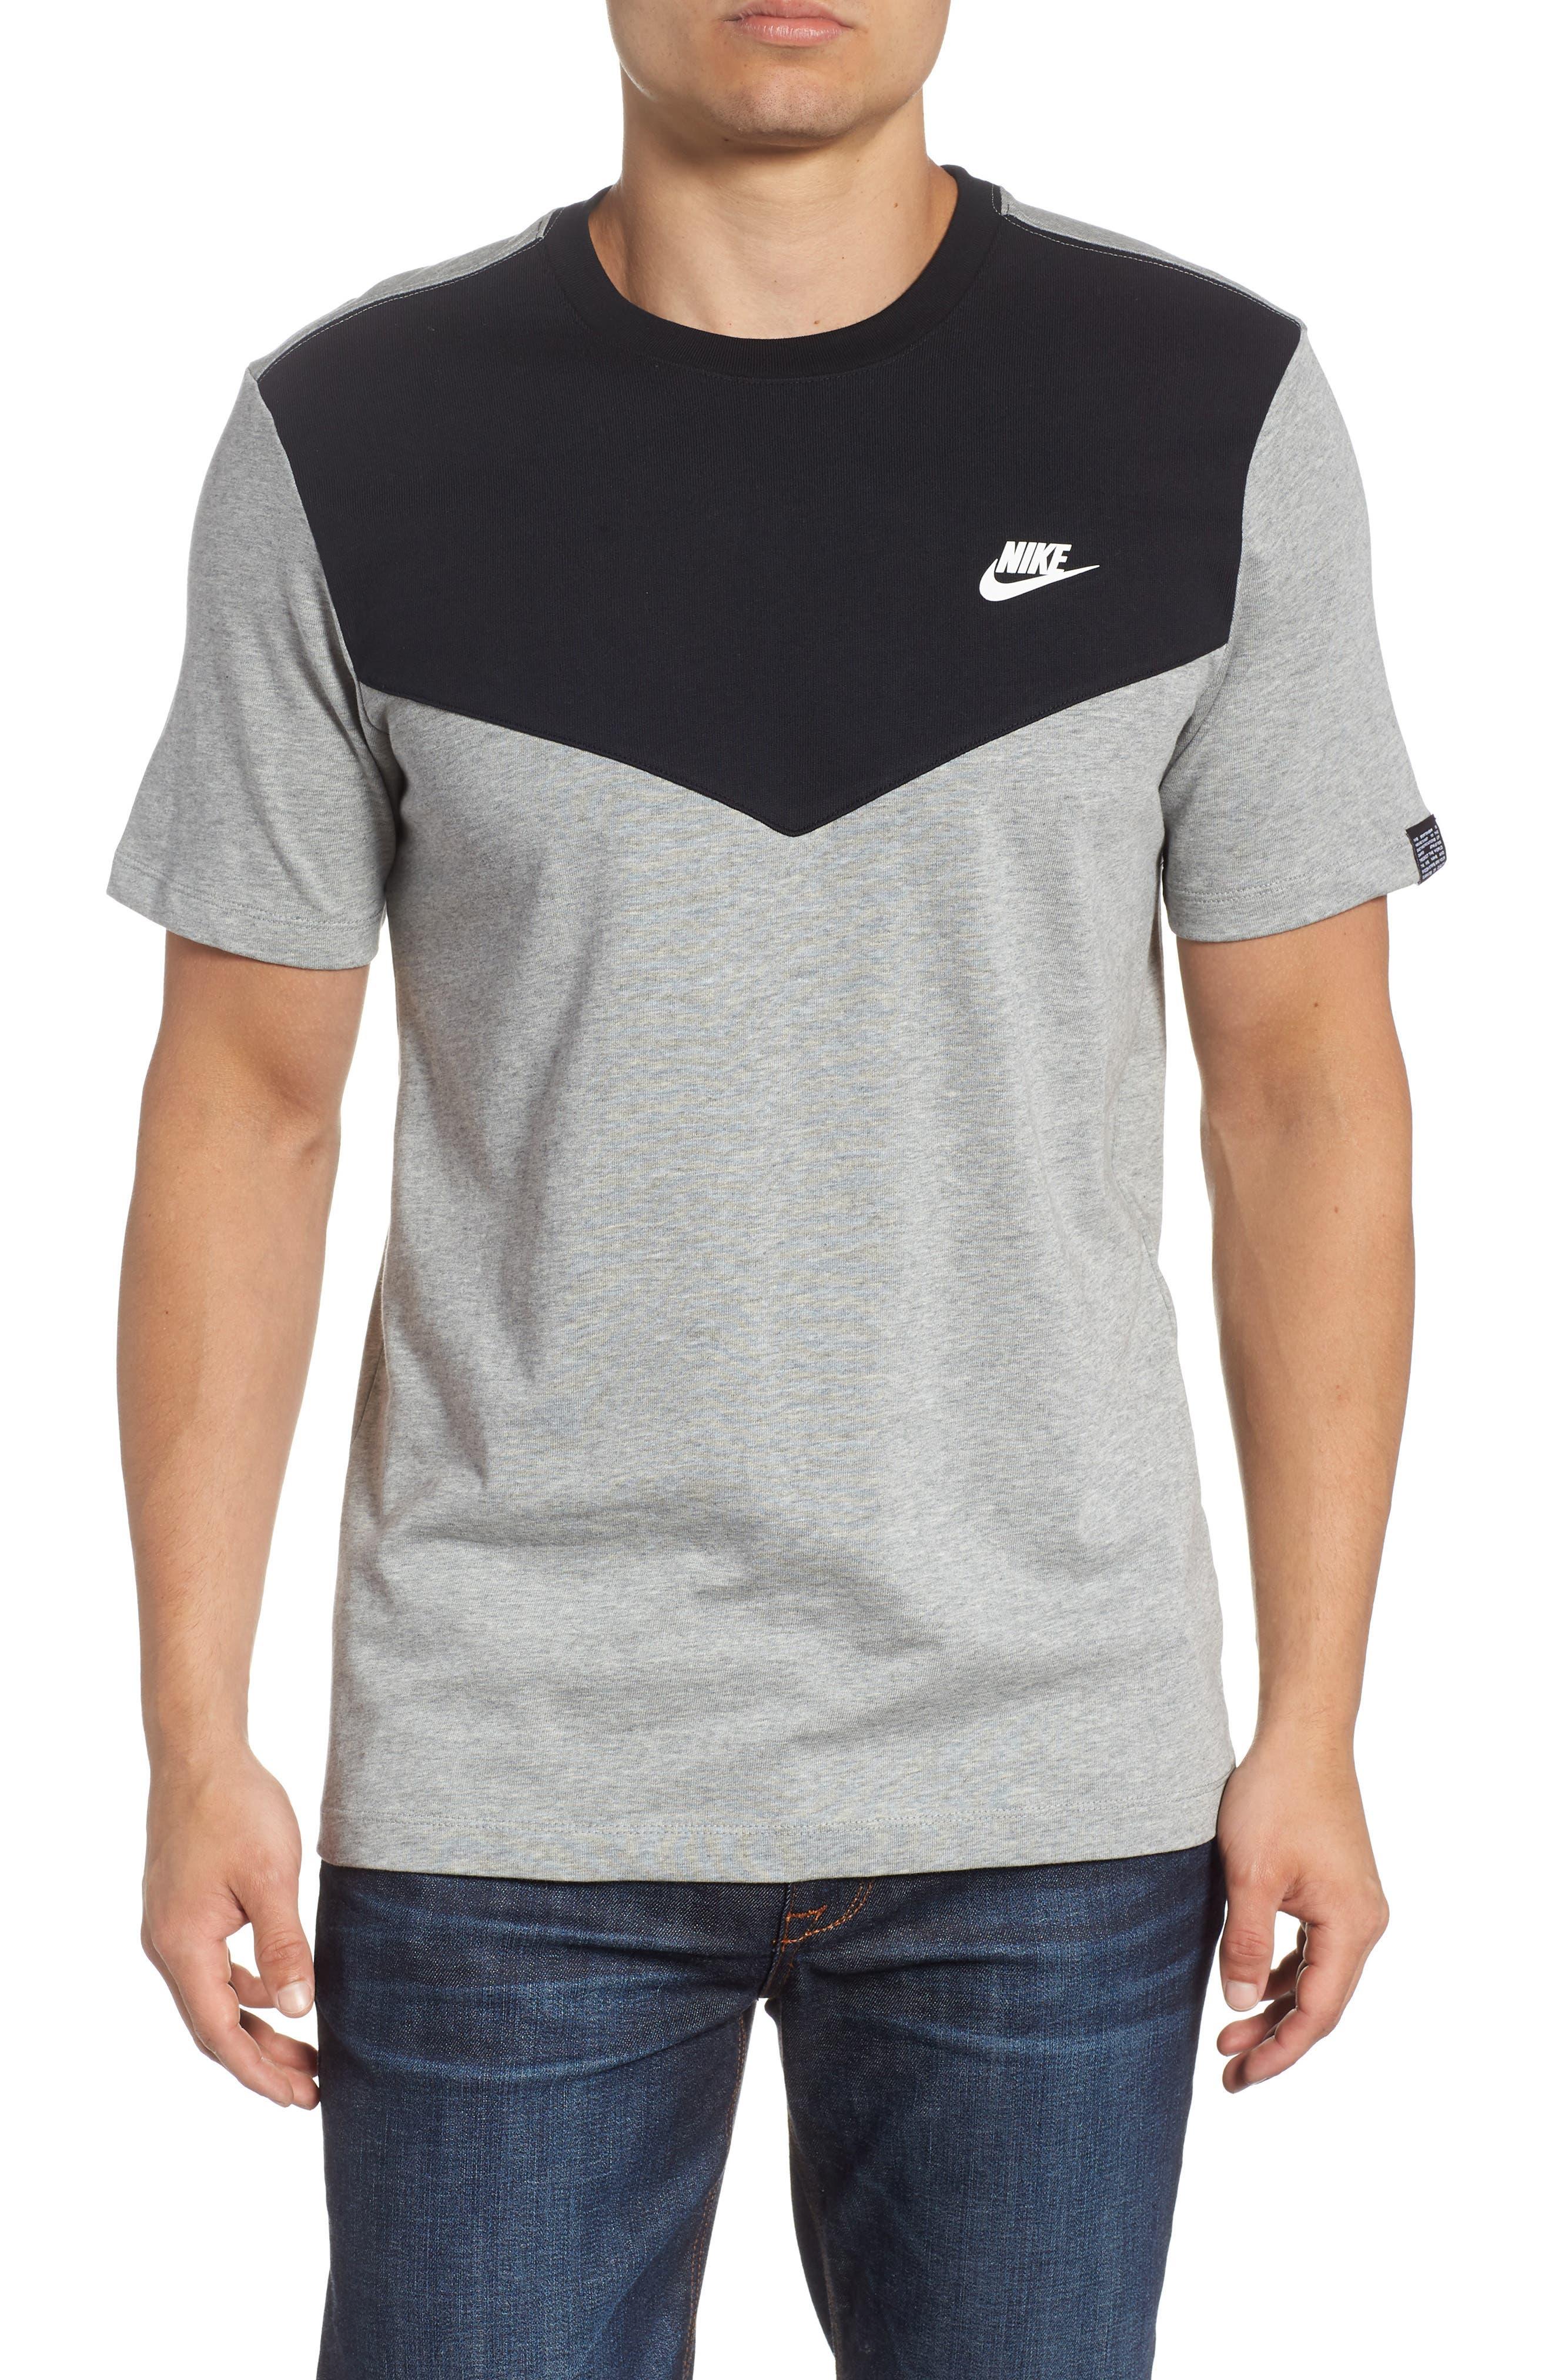 Windrunner Colorblocked T-Shirt,                             Main thumbnail 1, color,                             BLACK/ DK GREY HEATHER/ WHITE